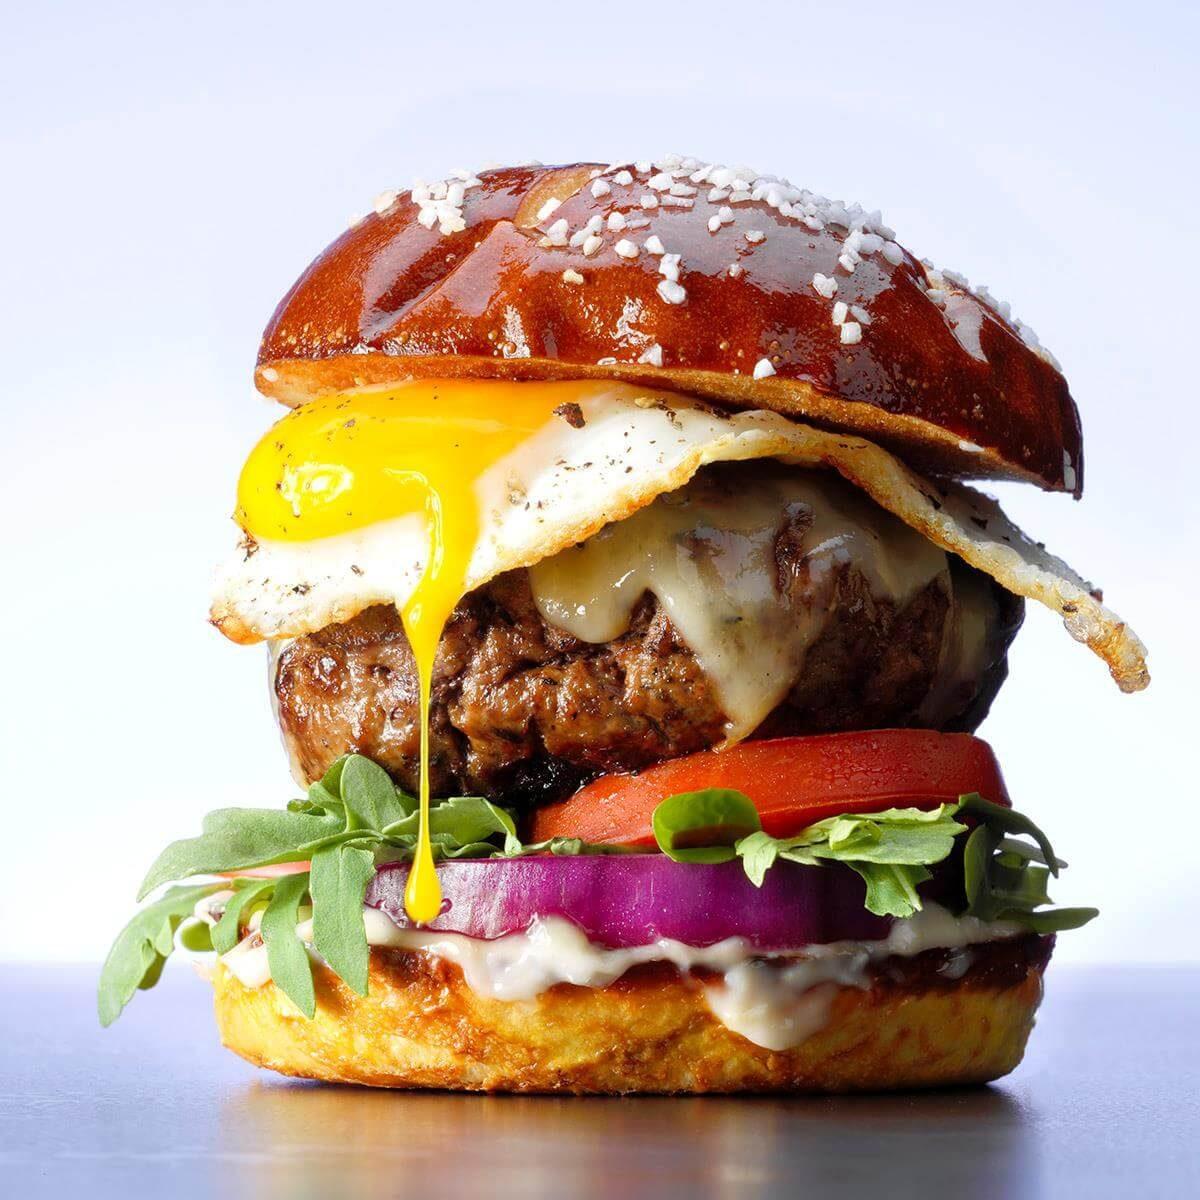 The Best Hamburger Recipes We've Ever Had